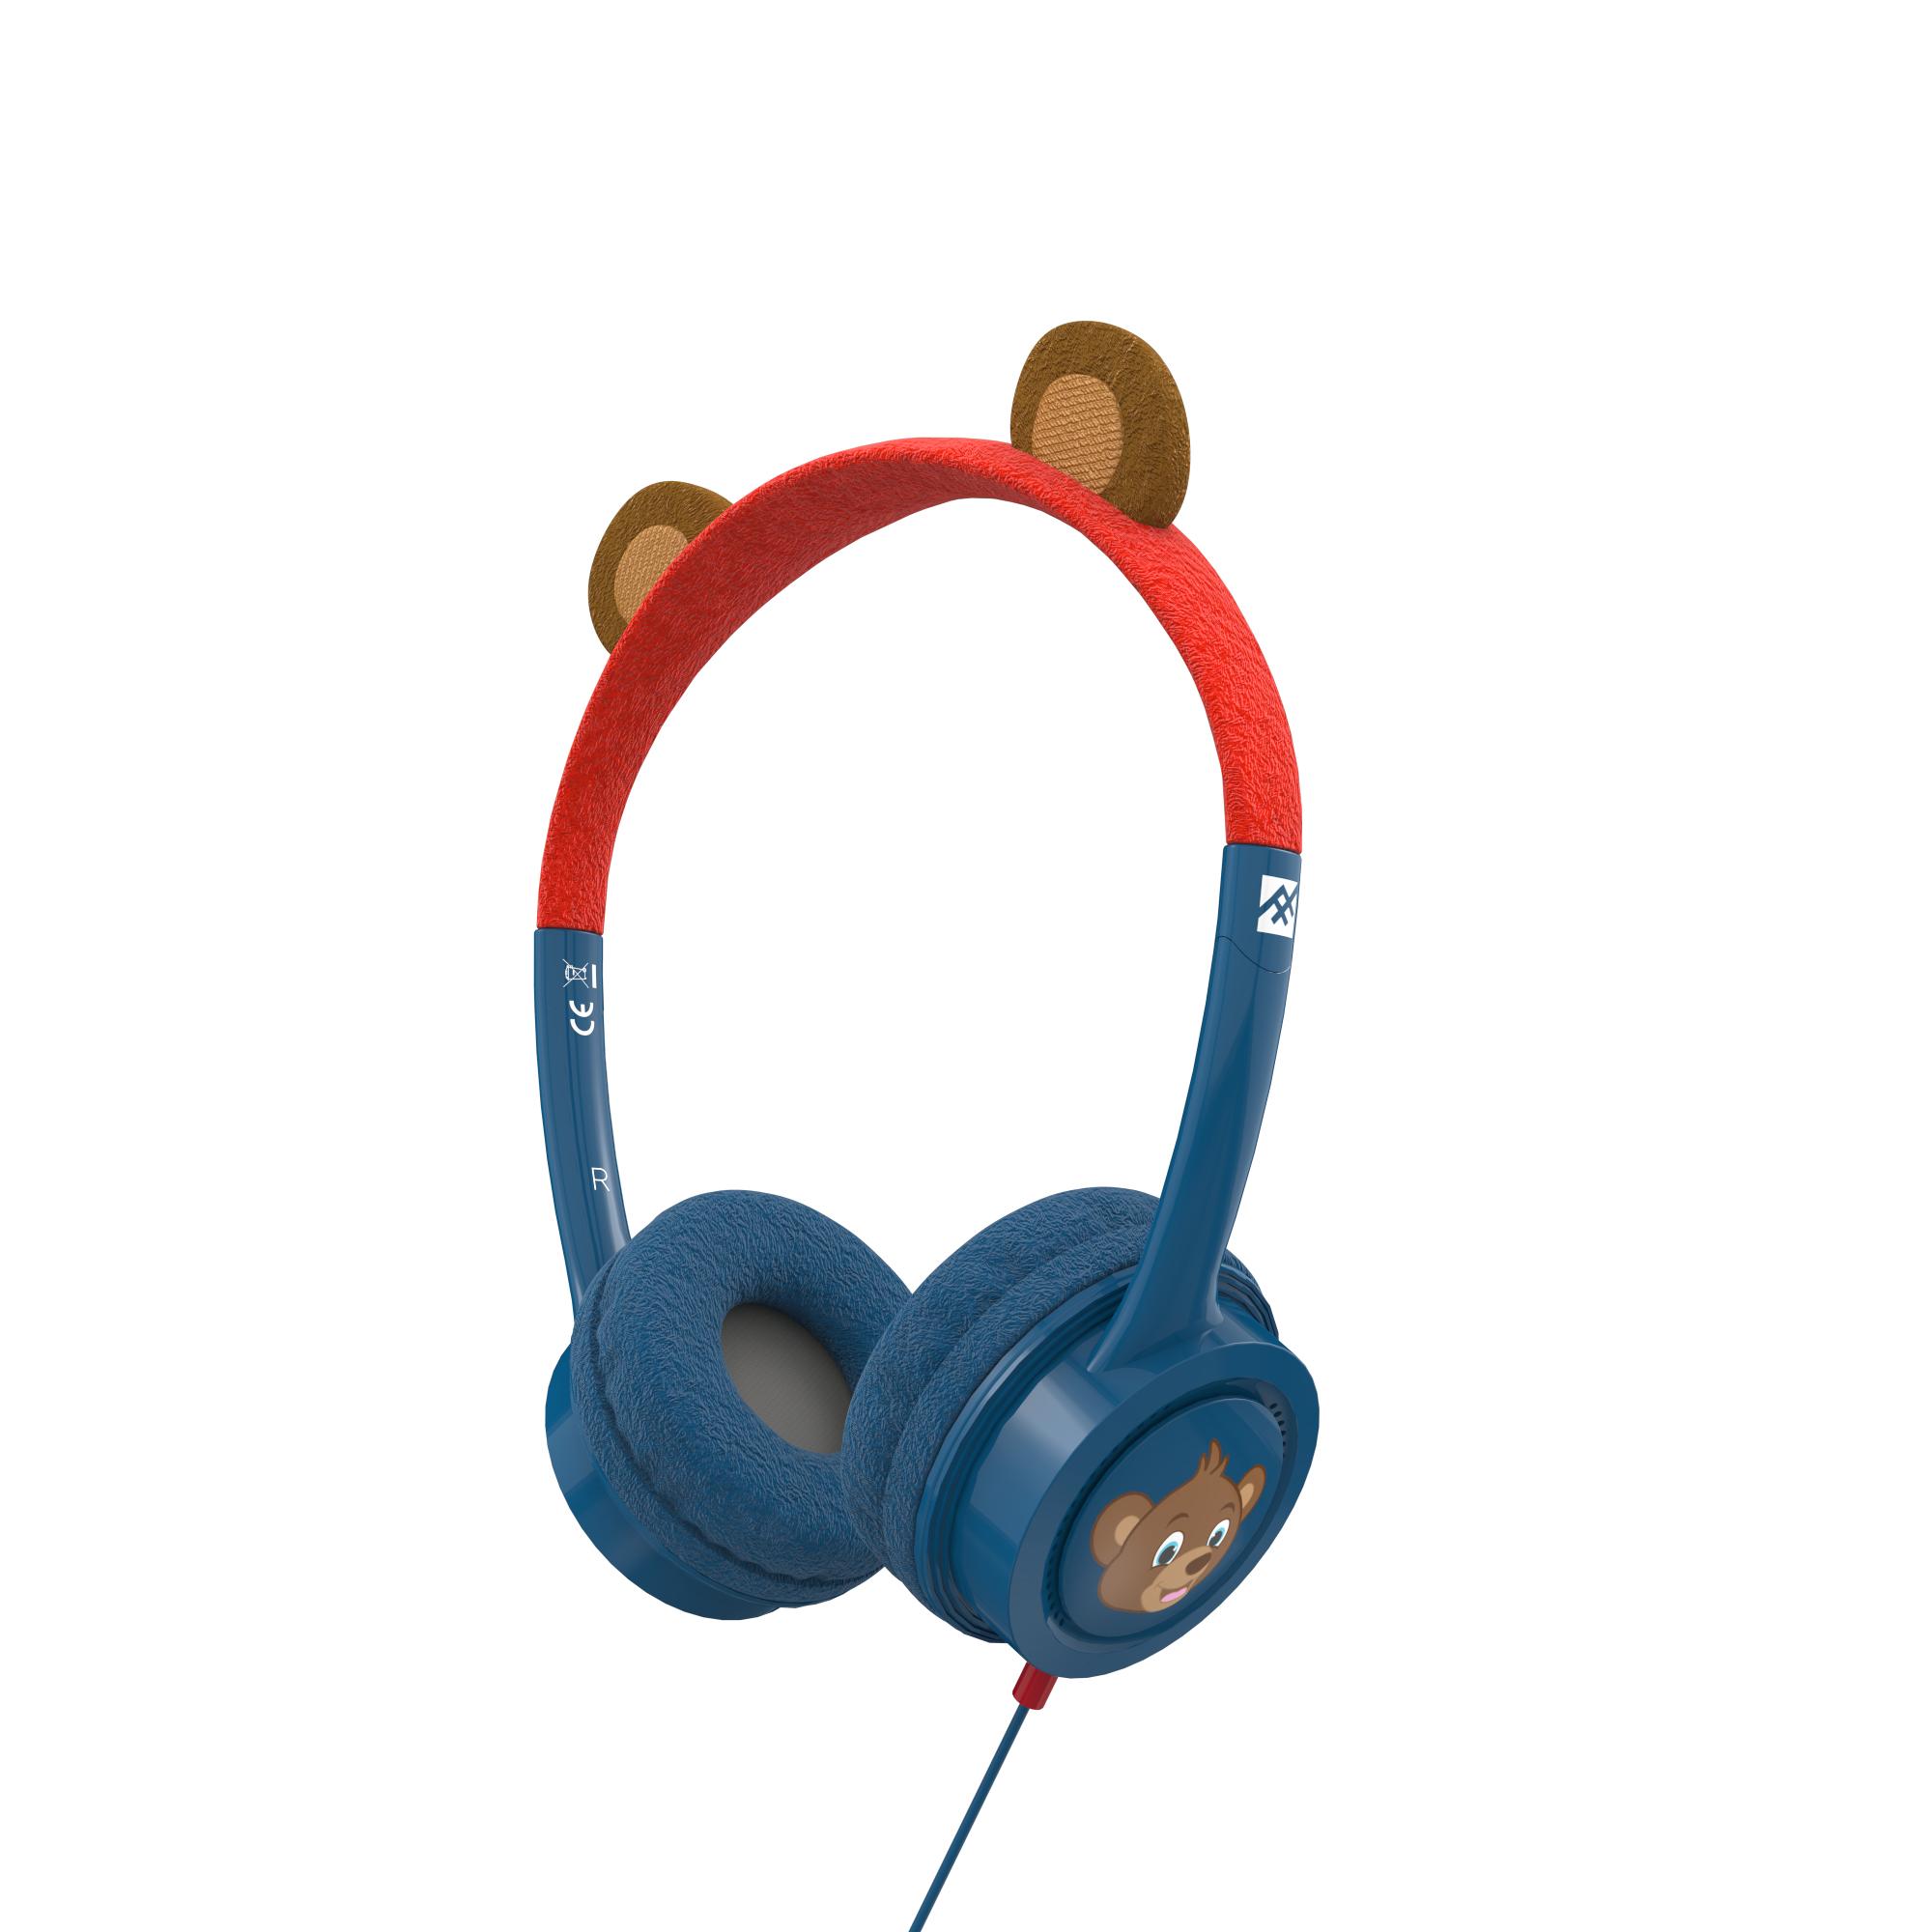 IFROGZ 304101845 auricular y casco Auriculares Diadema Azul, Marrón